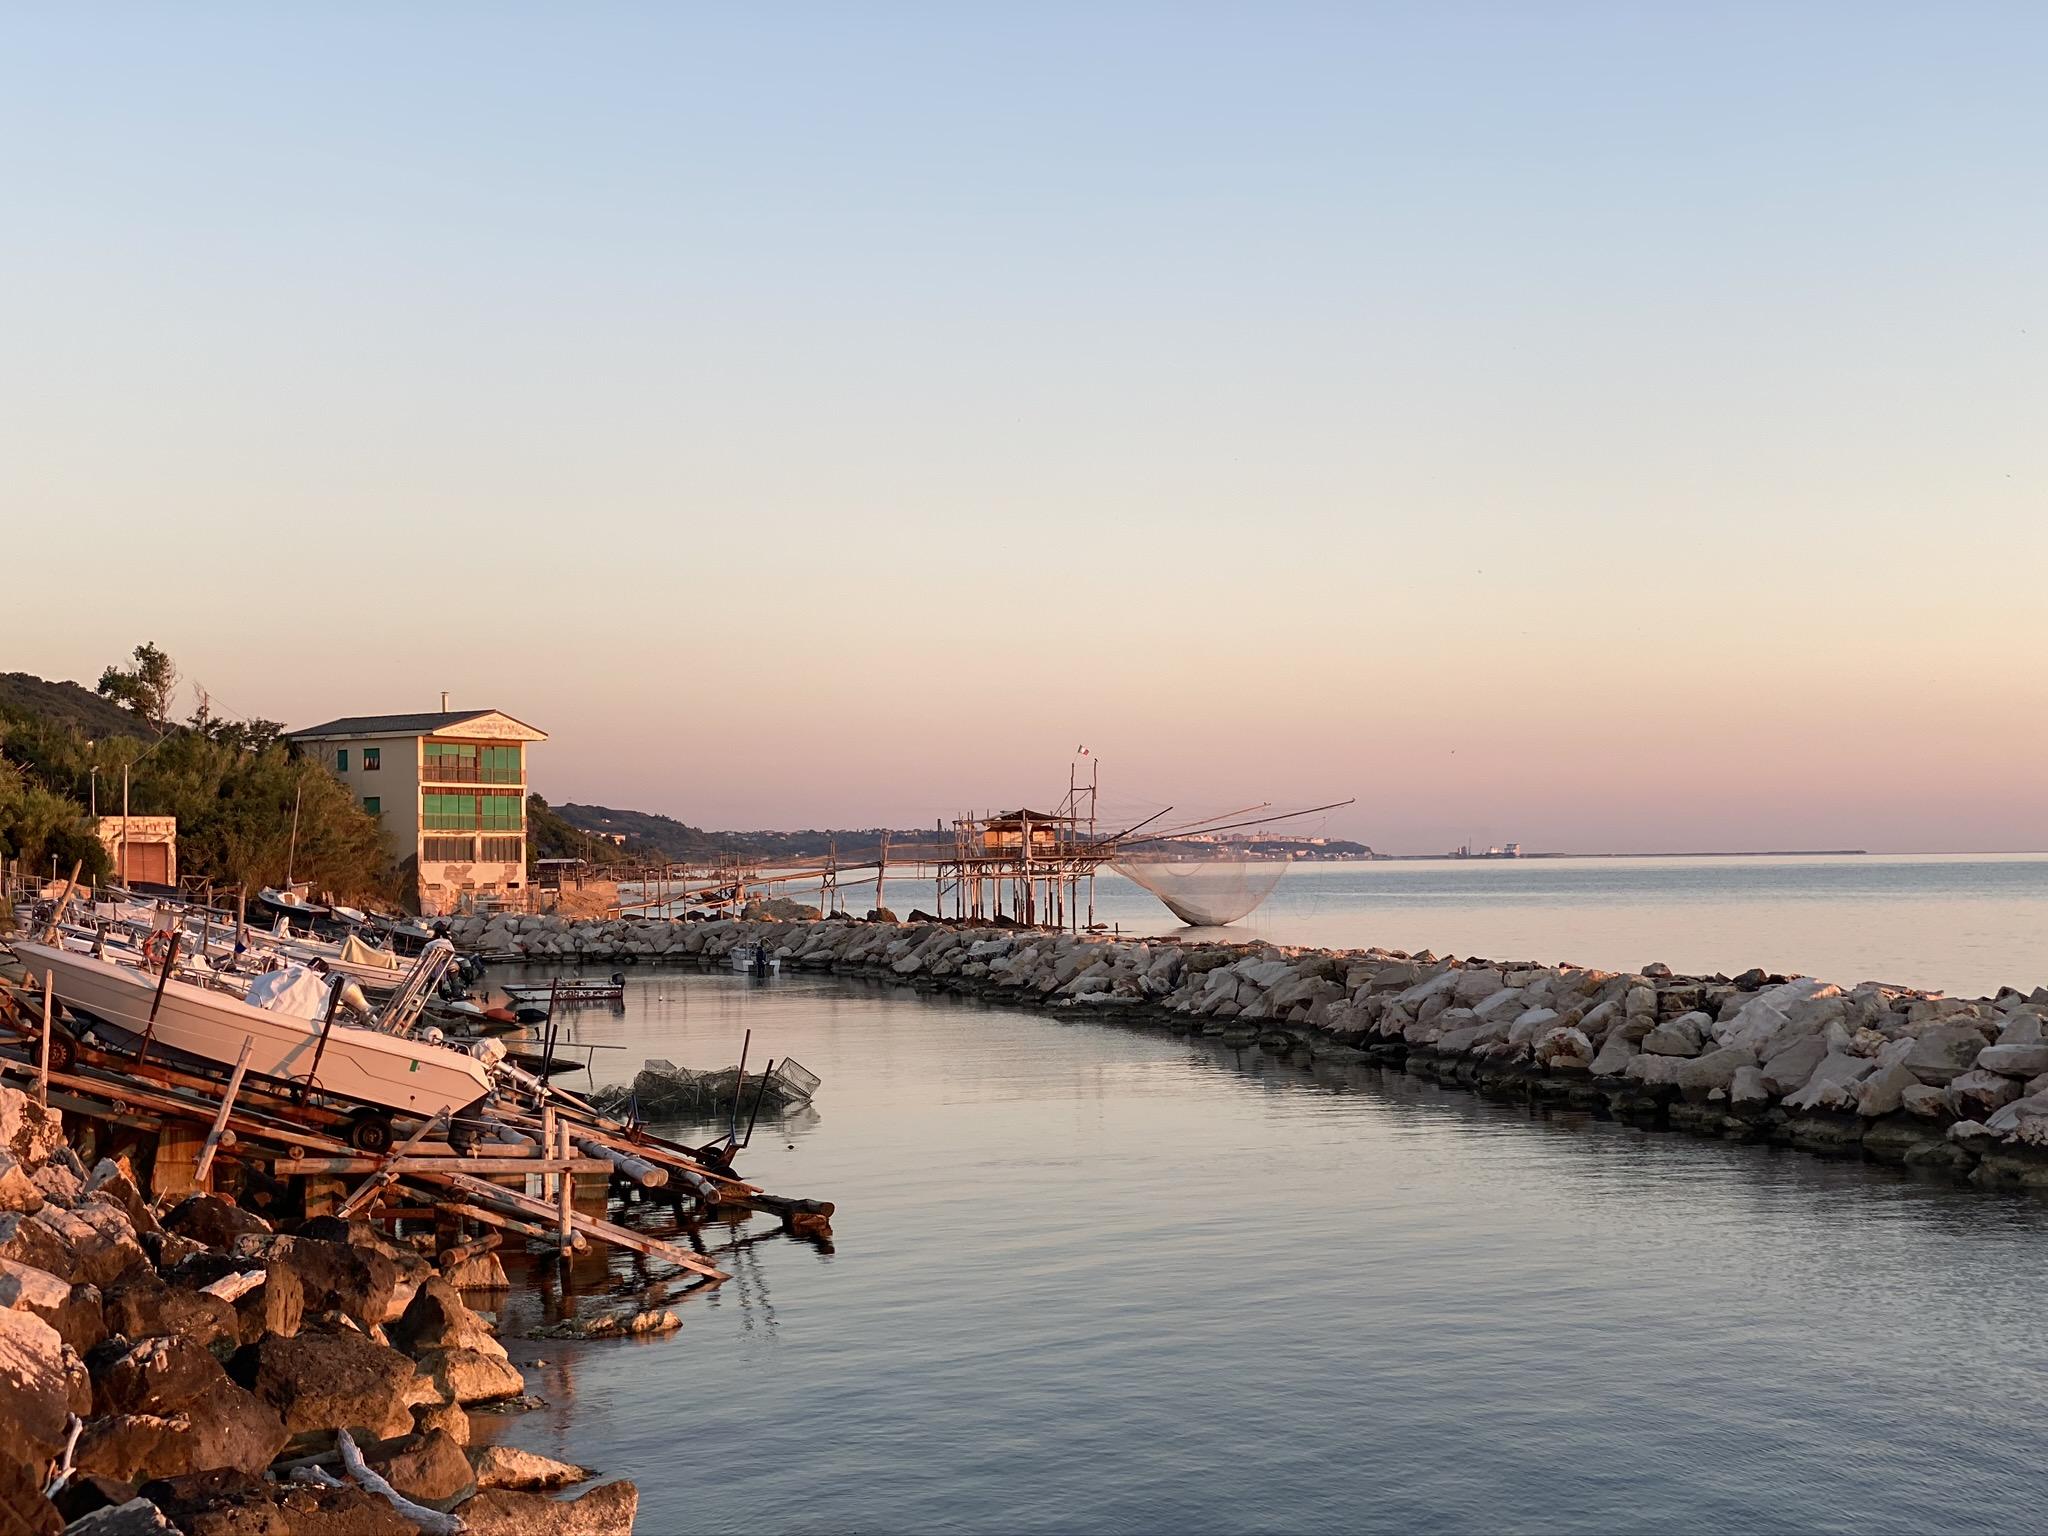 Fishing Tourism Experience On The Trabocchi Coast